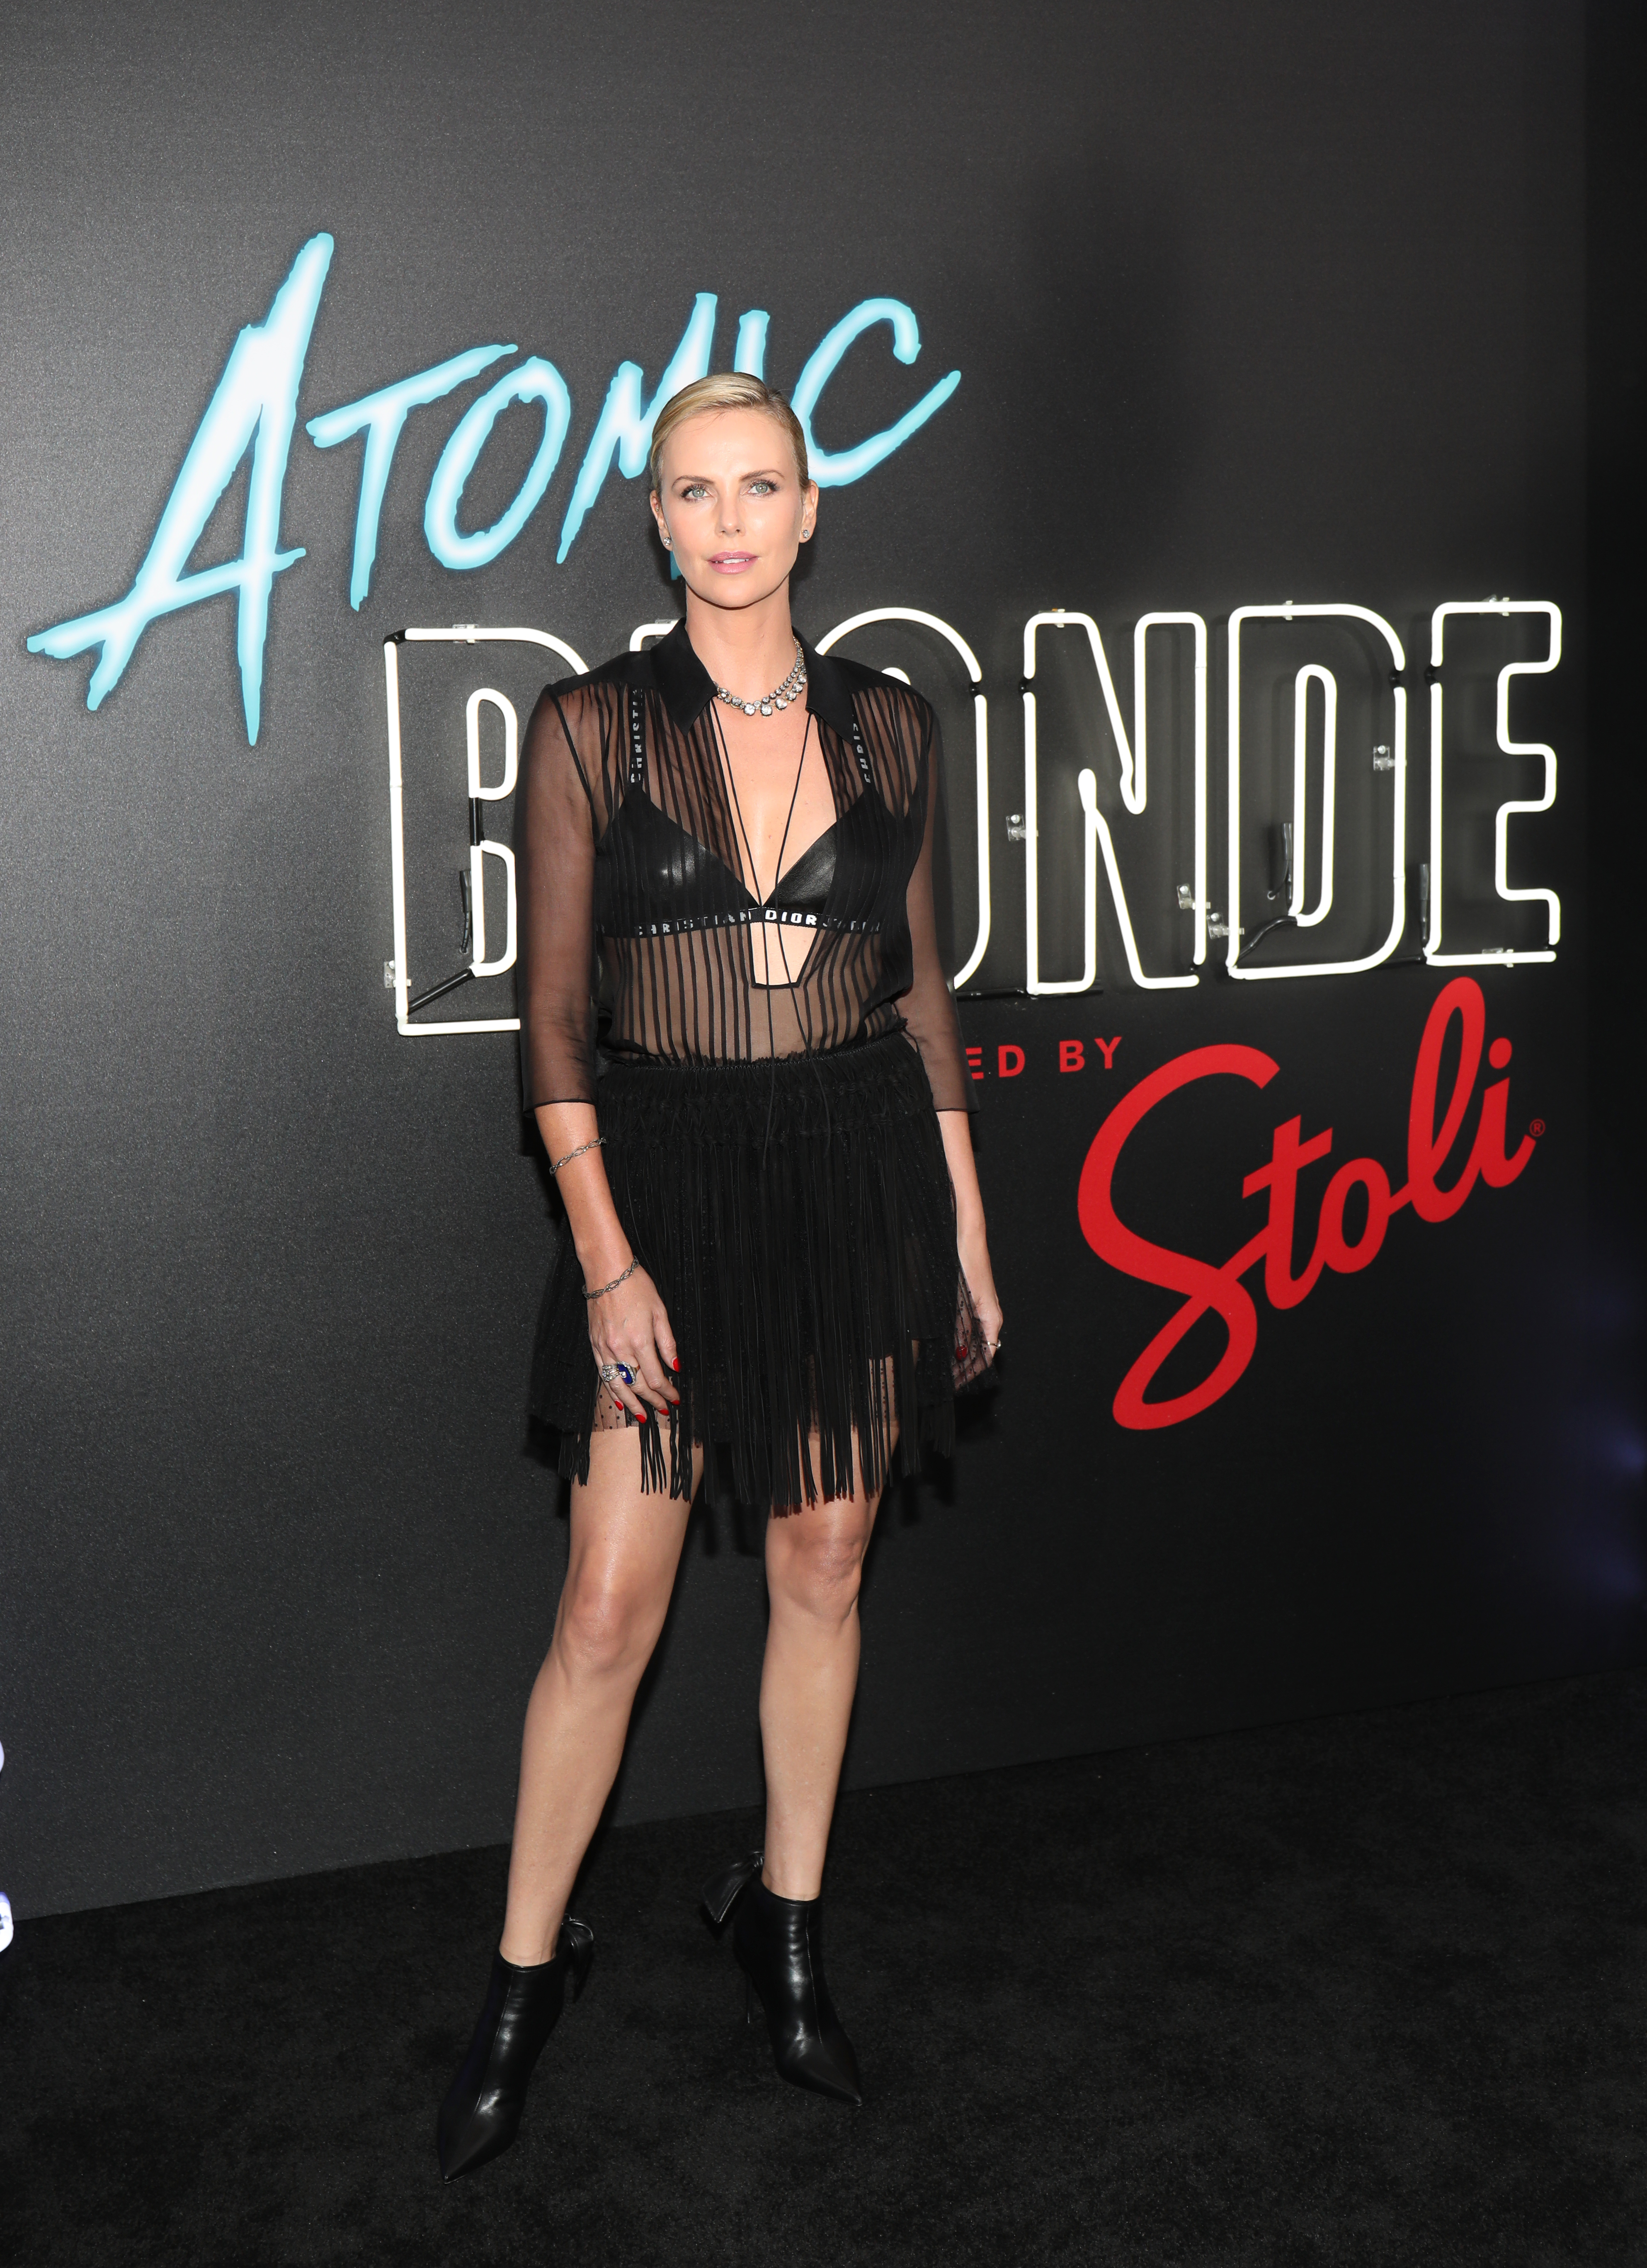 Charlize Theron, atomic blonde, looks, estilo, moda, style